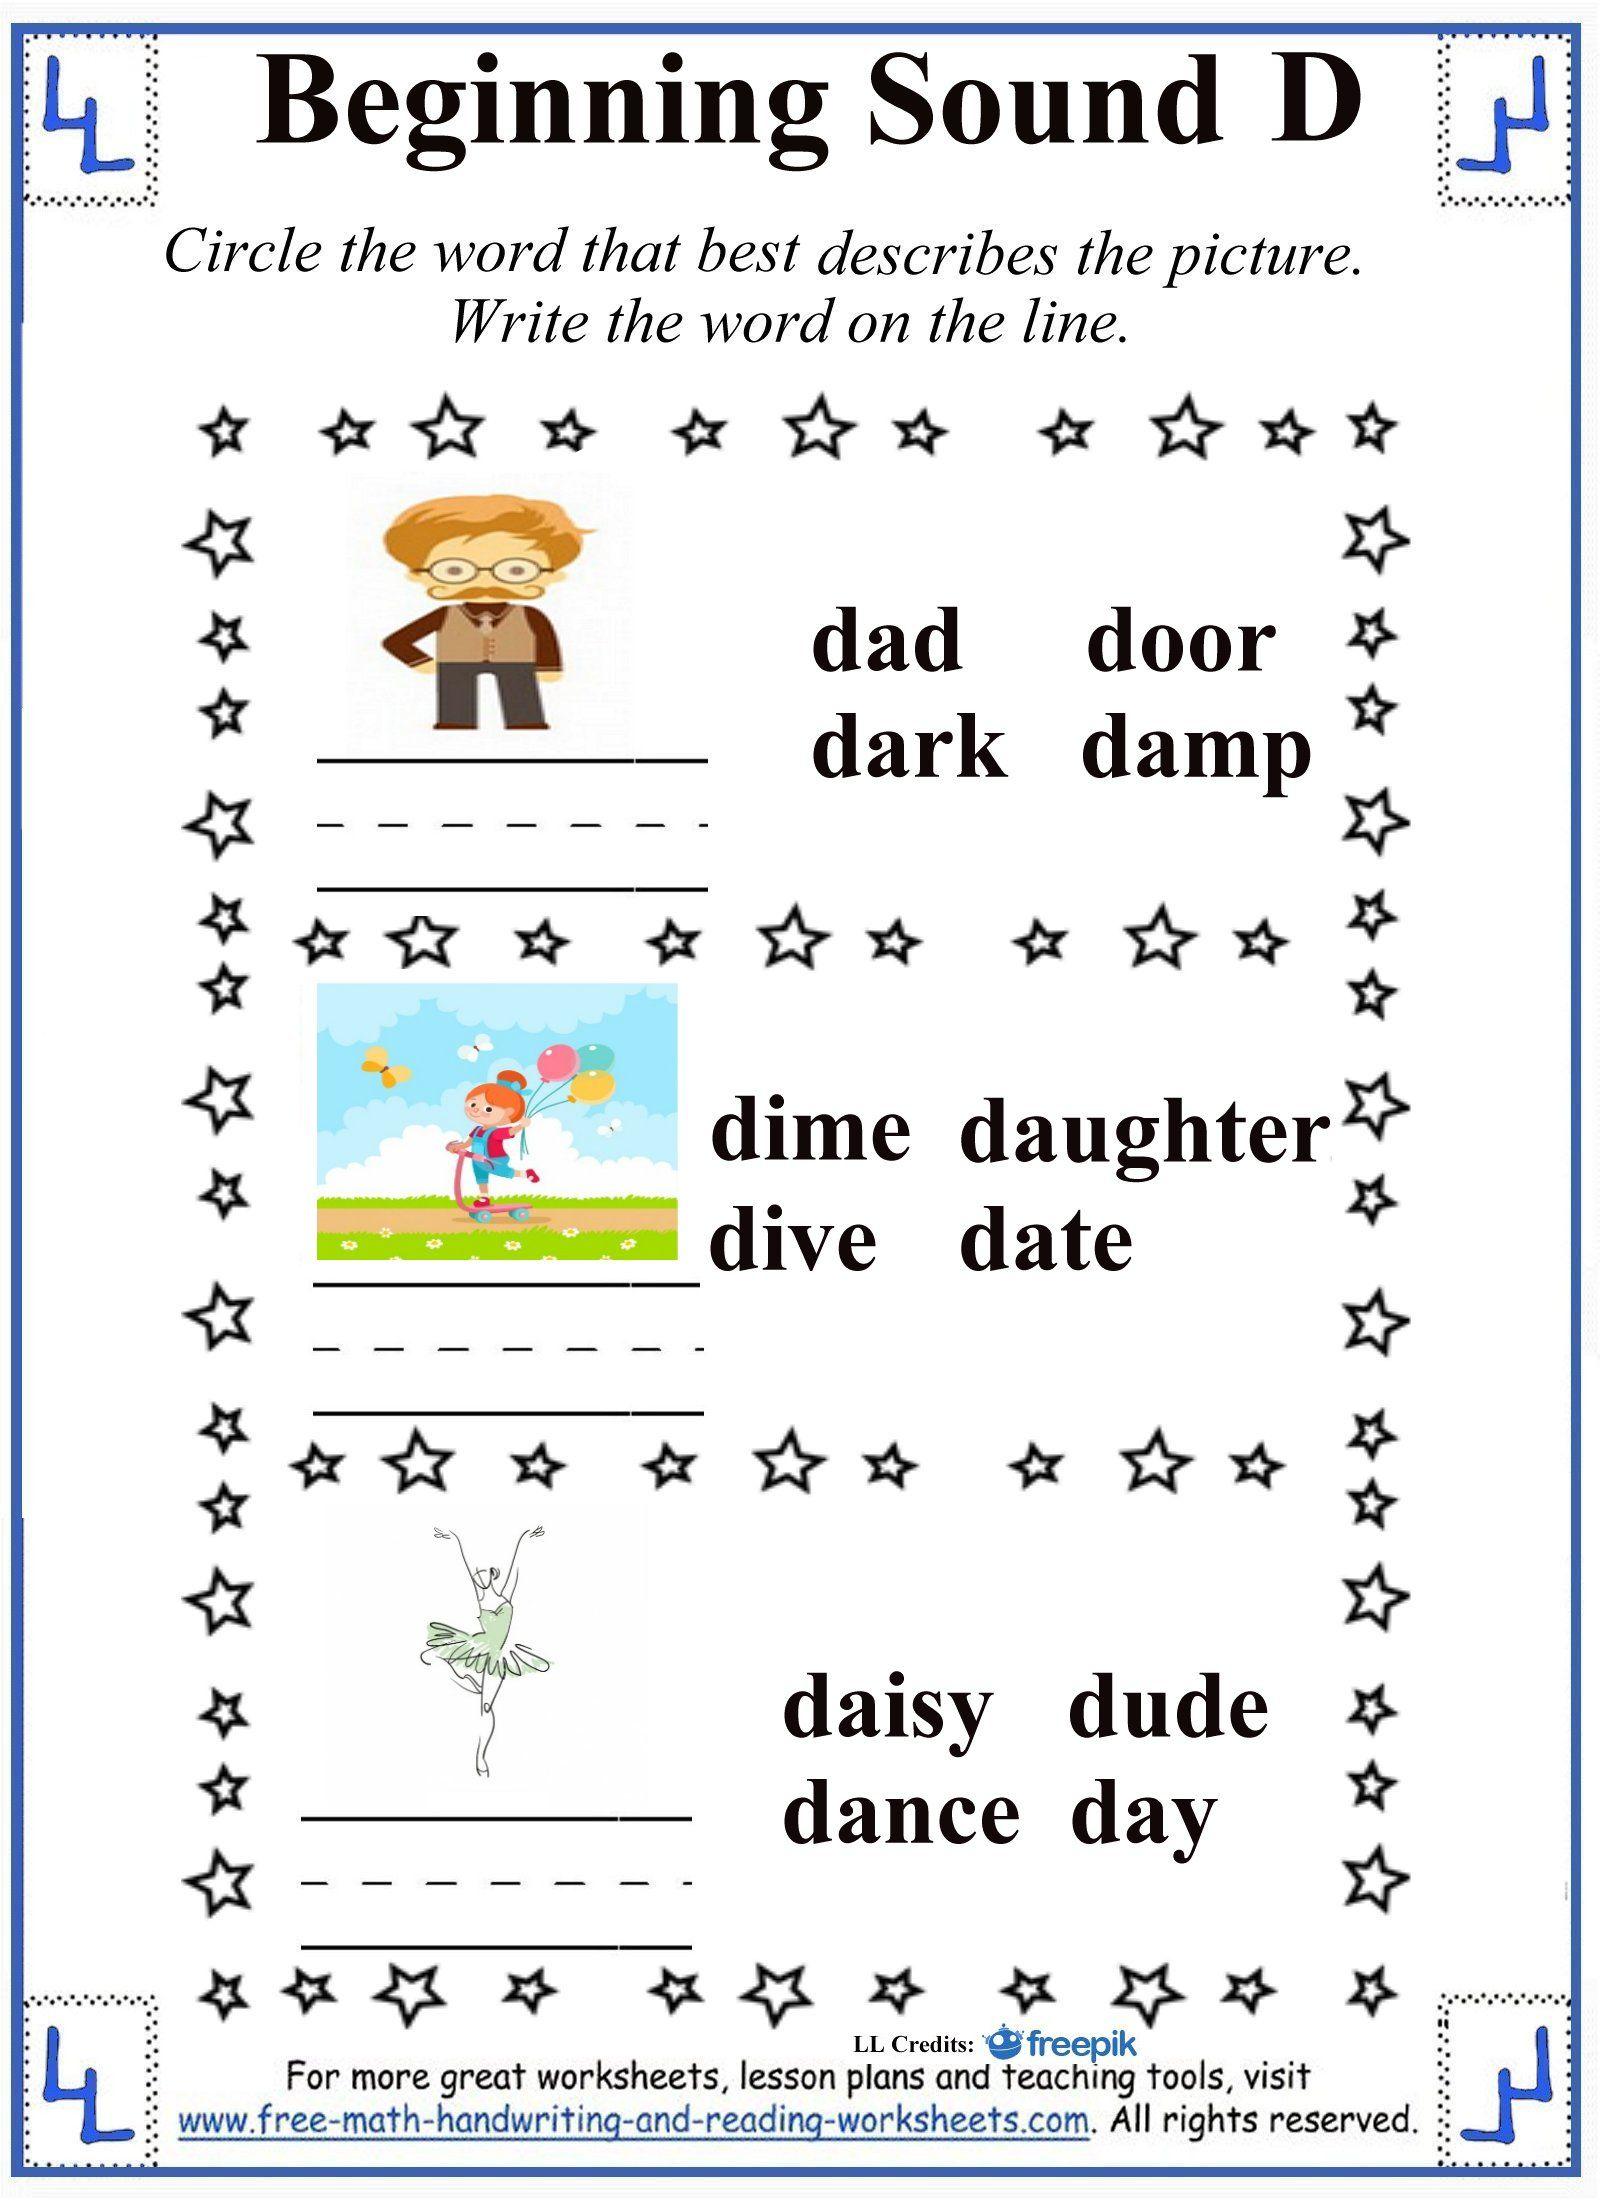 D Letter Worksheets Reading Worksheets Teaching The Alphabet Letter Worksheets [ 2200 x 1600 Pixel ]